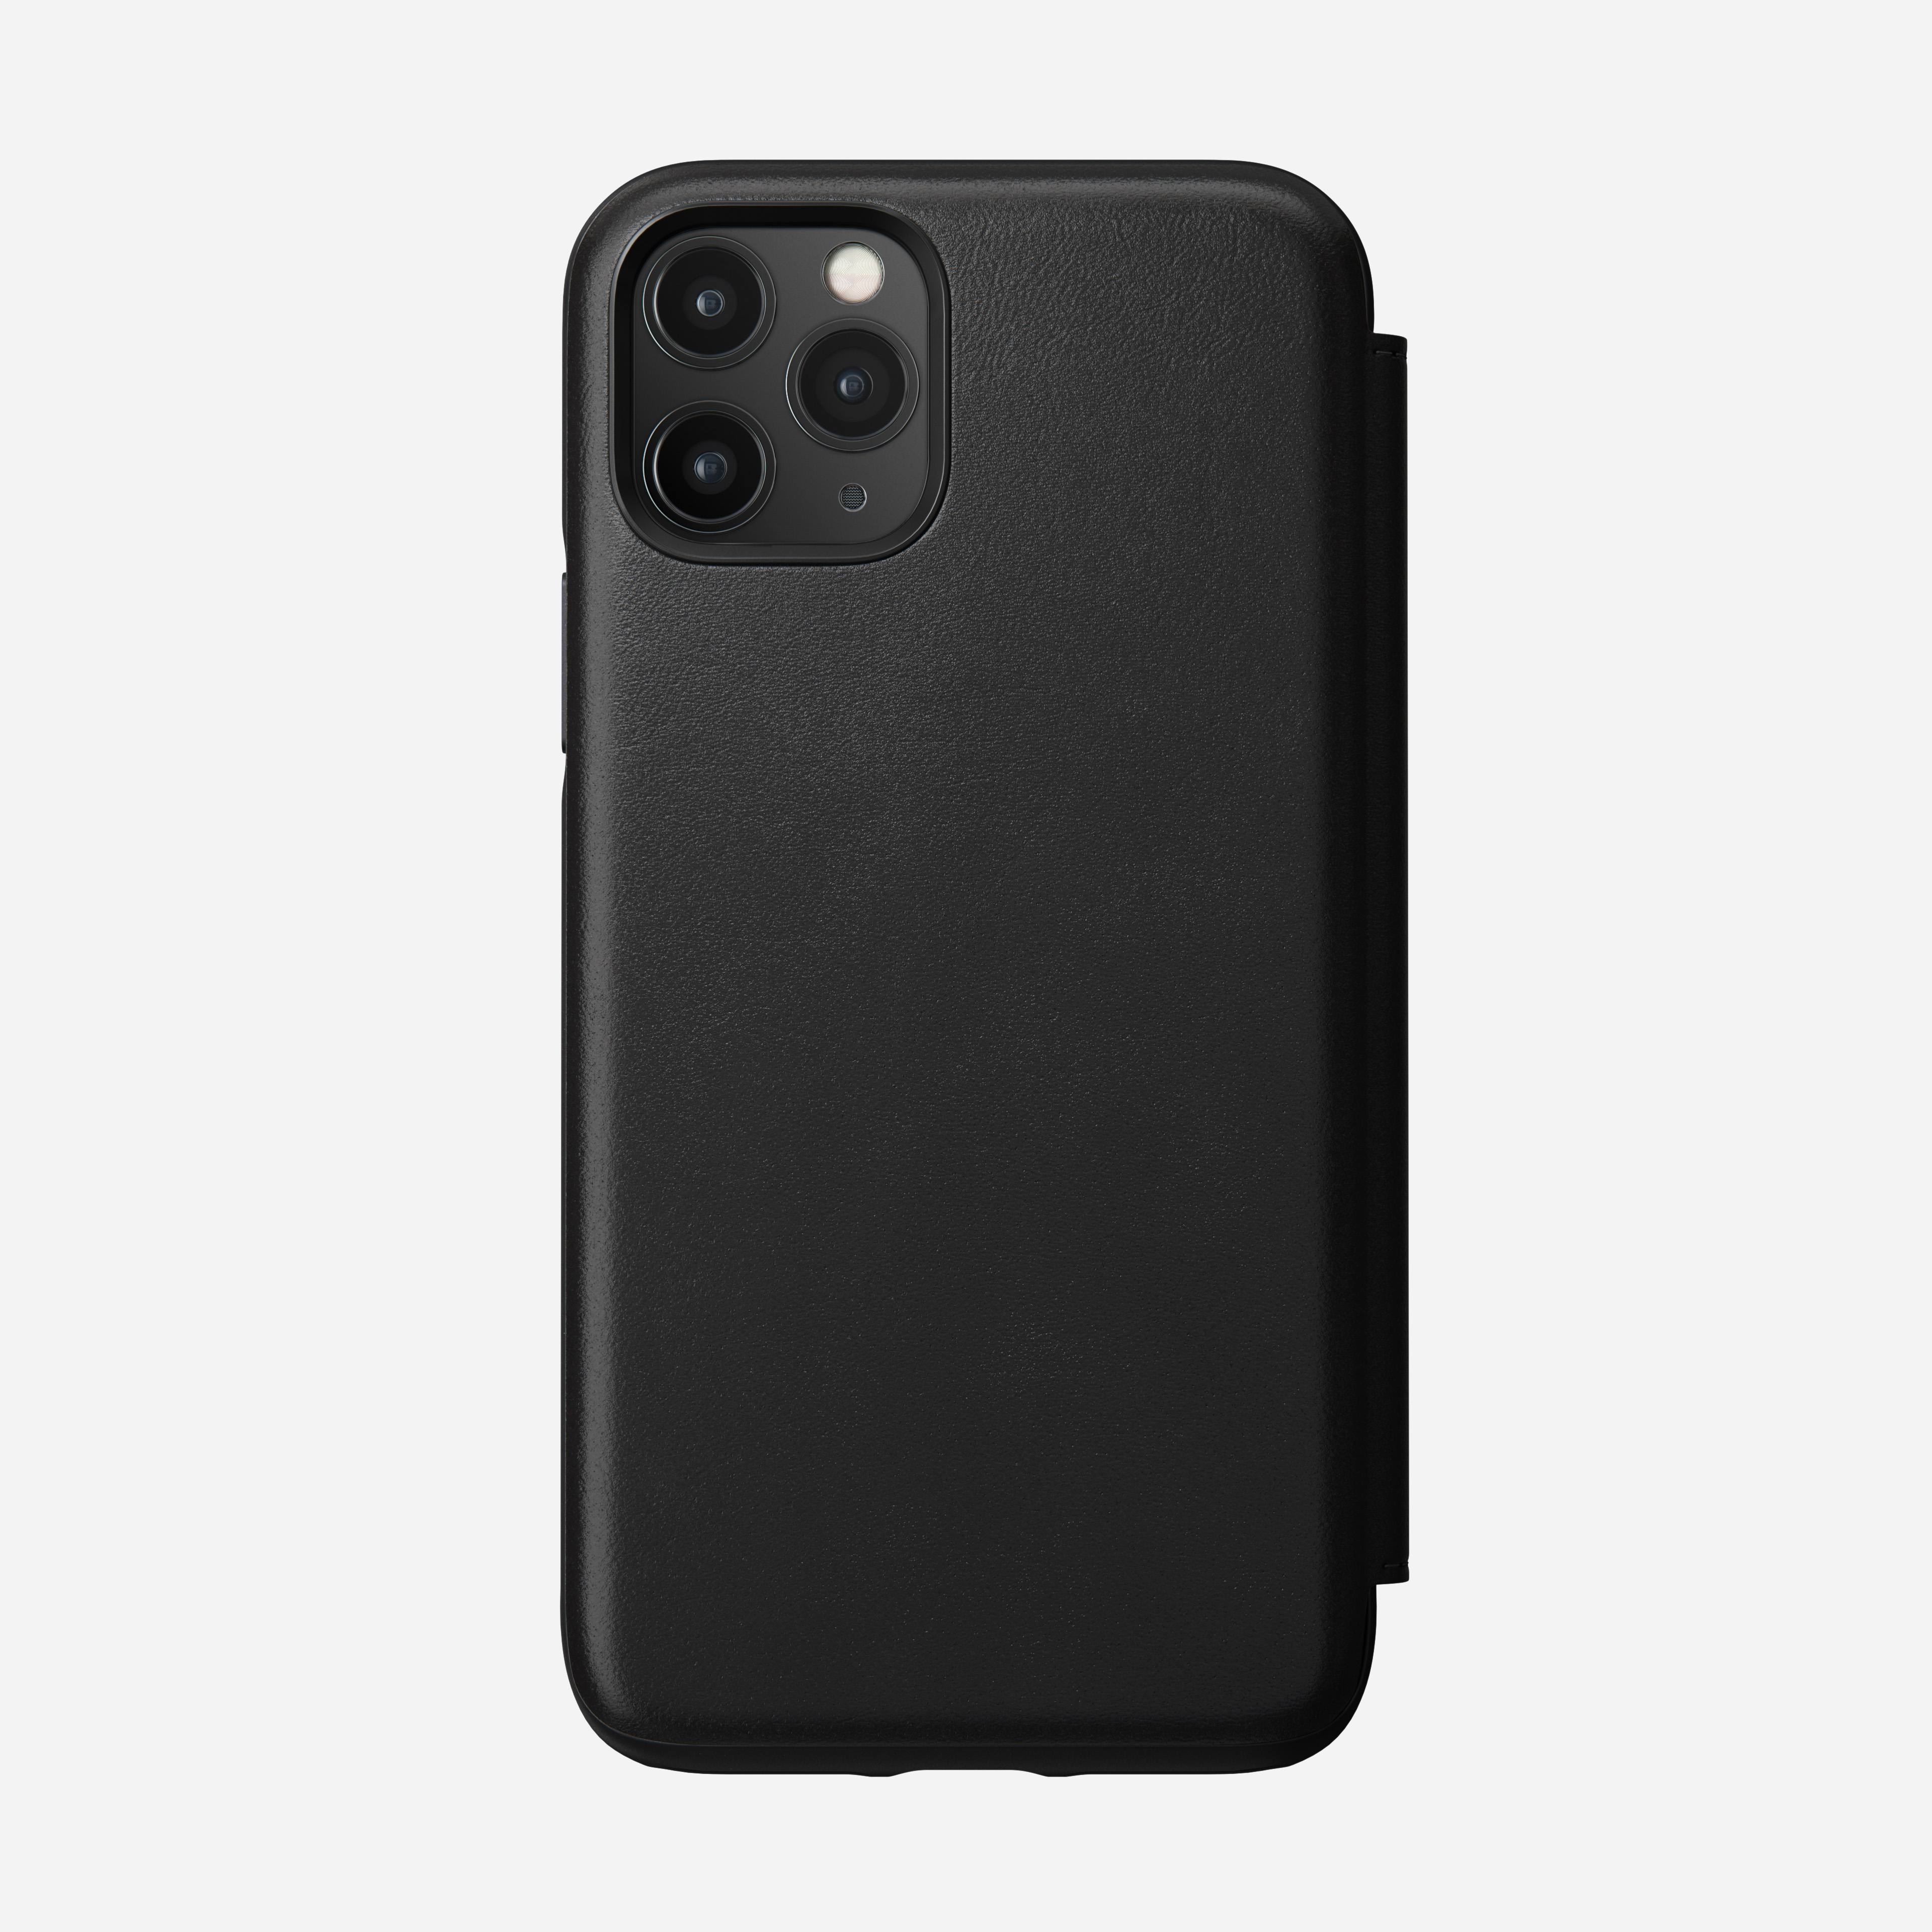 Rugged Leather Folio Case for iPhone 11 Pro, Black